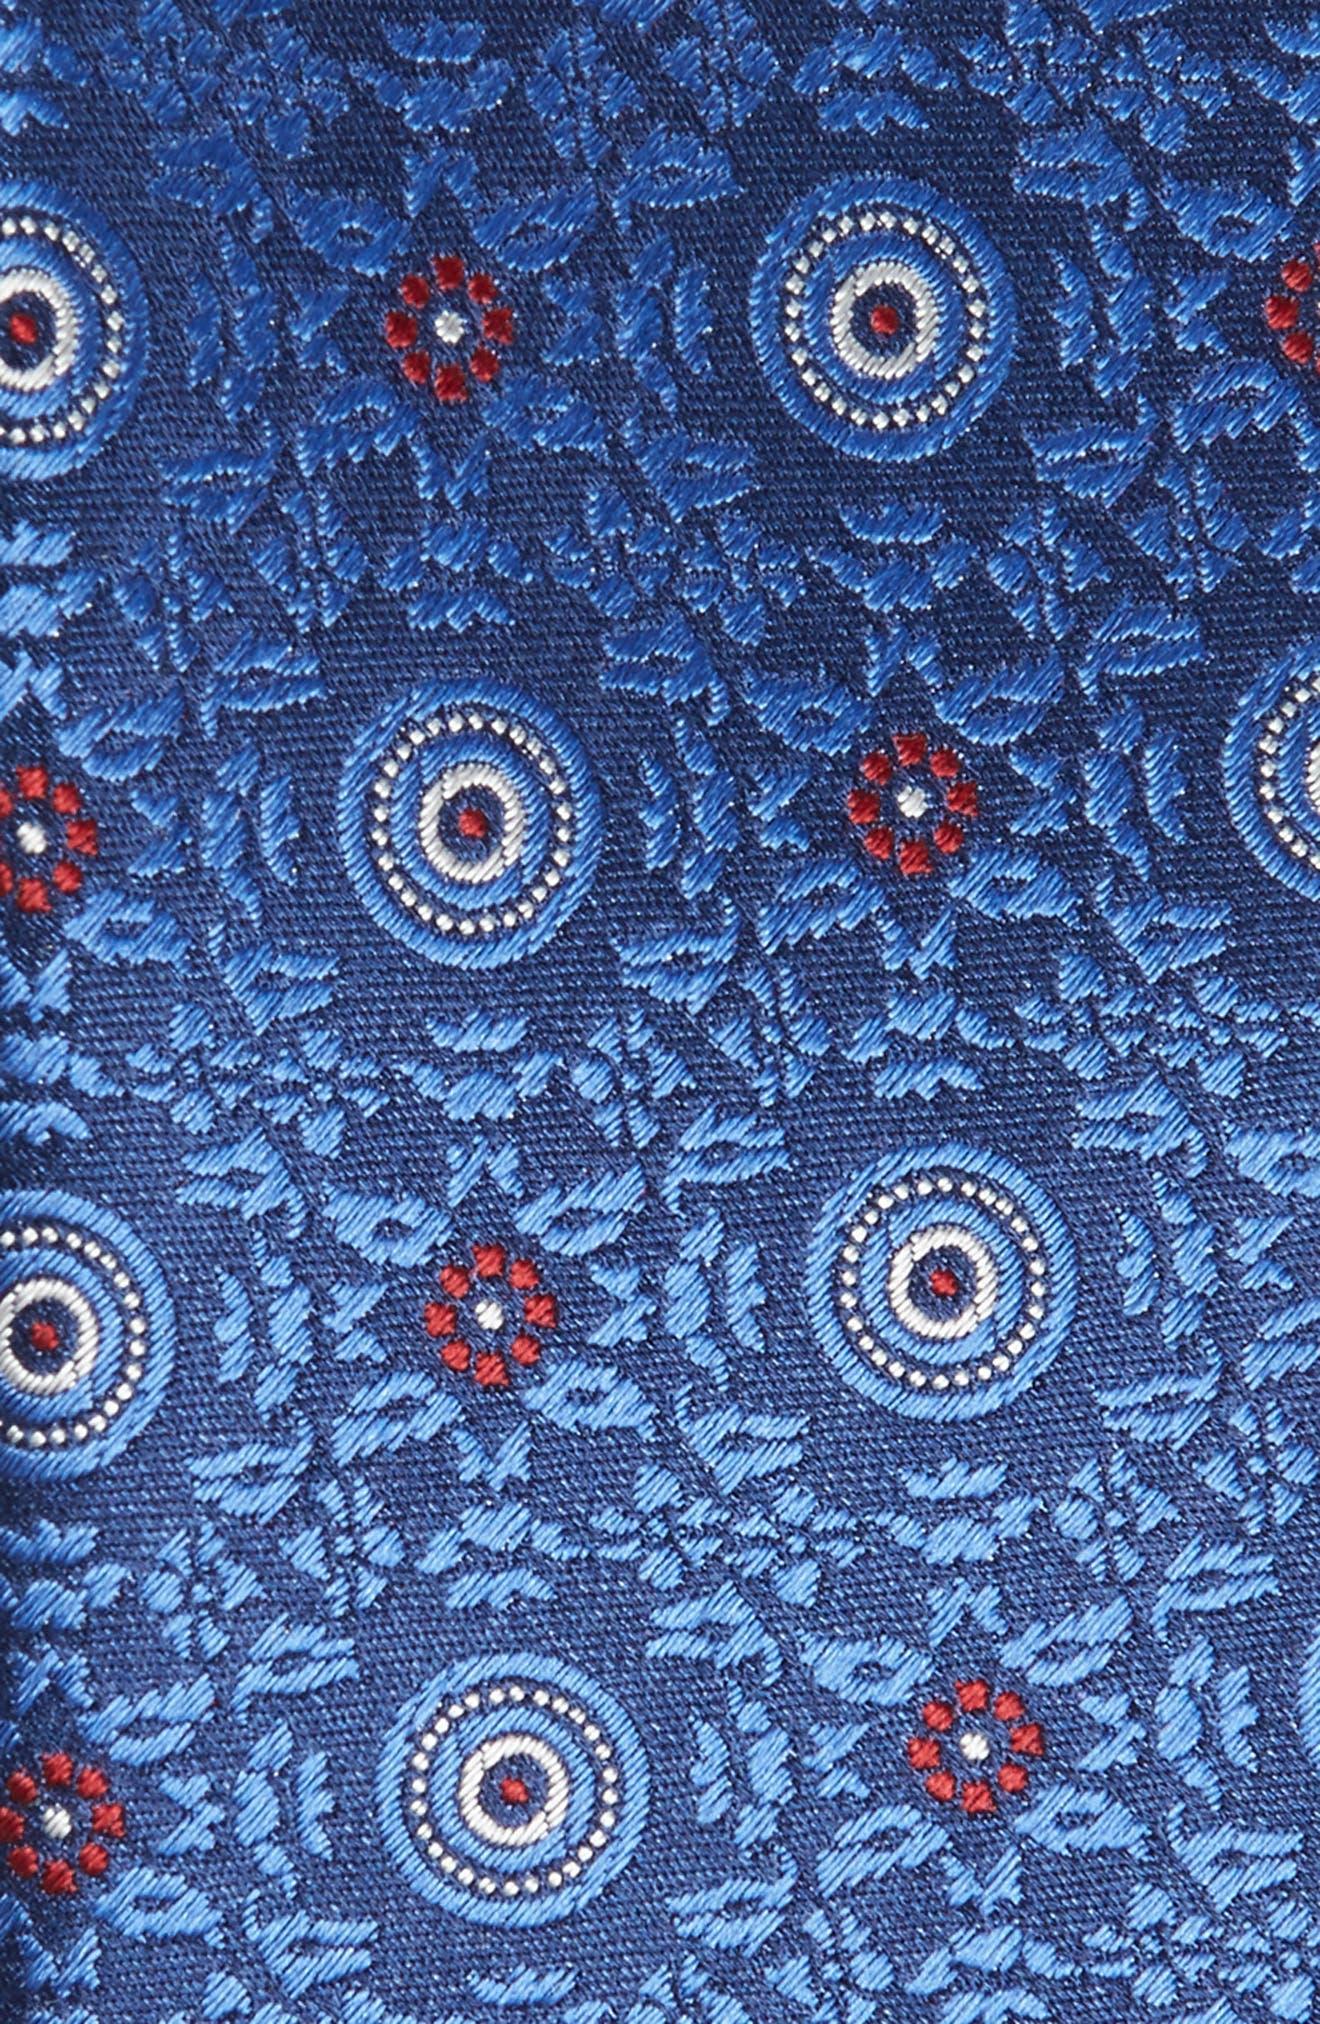 CANALI, Medallion Silk X-Long Tie, Alternate thumbnail 2, color, BLUE